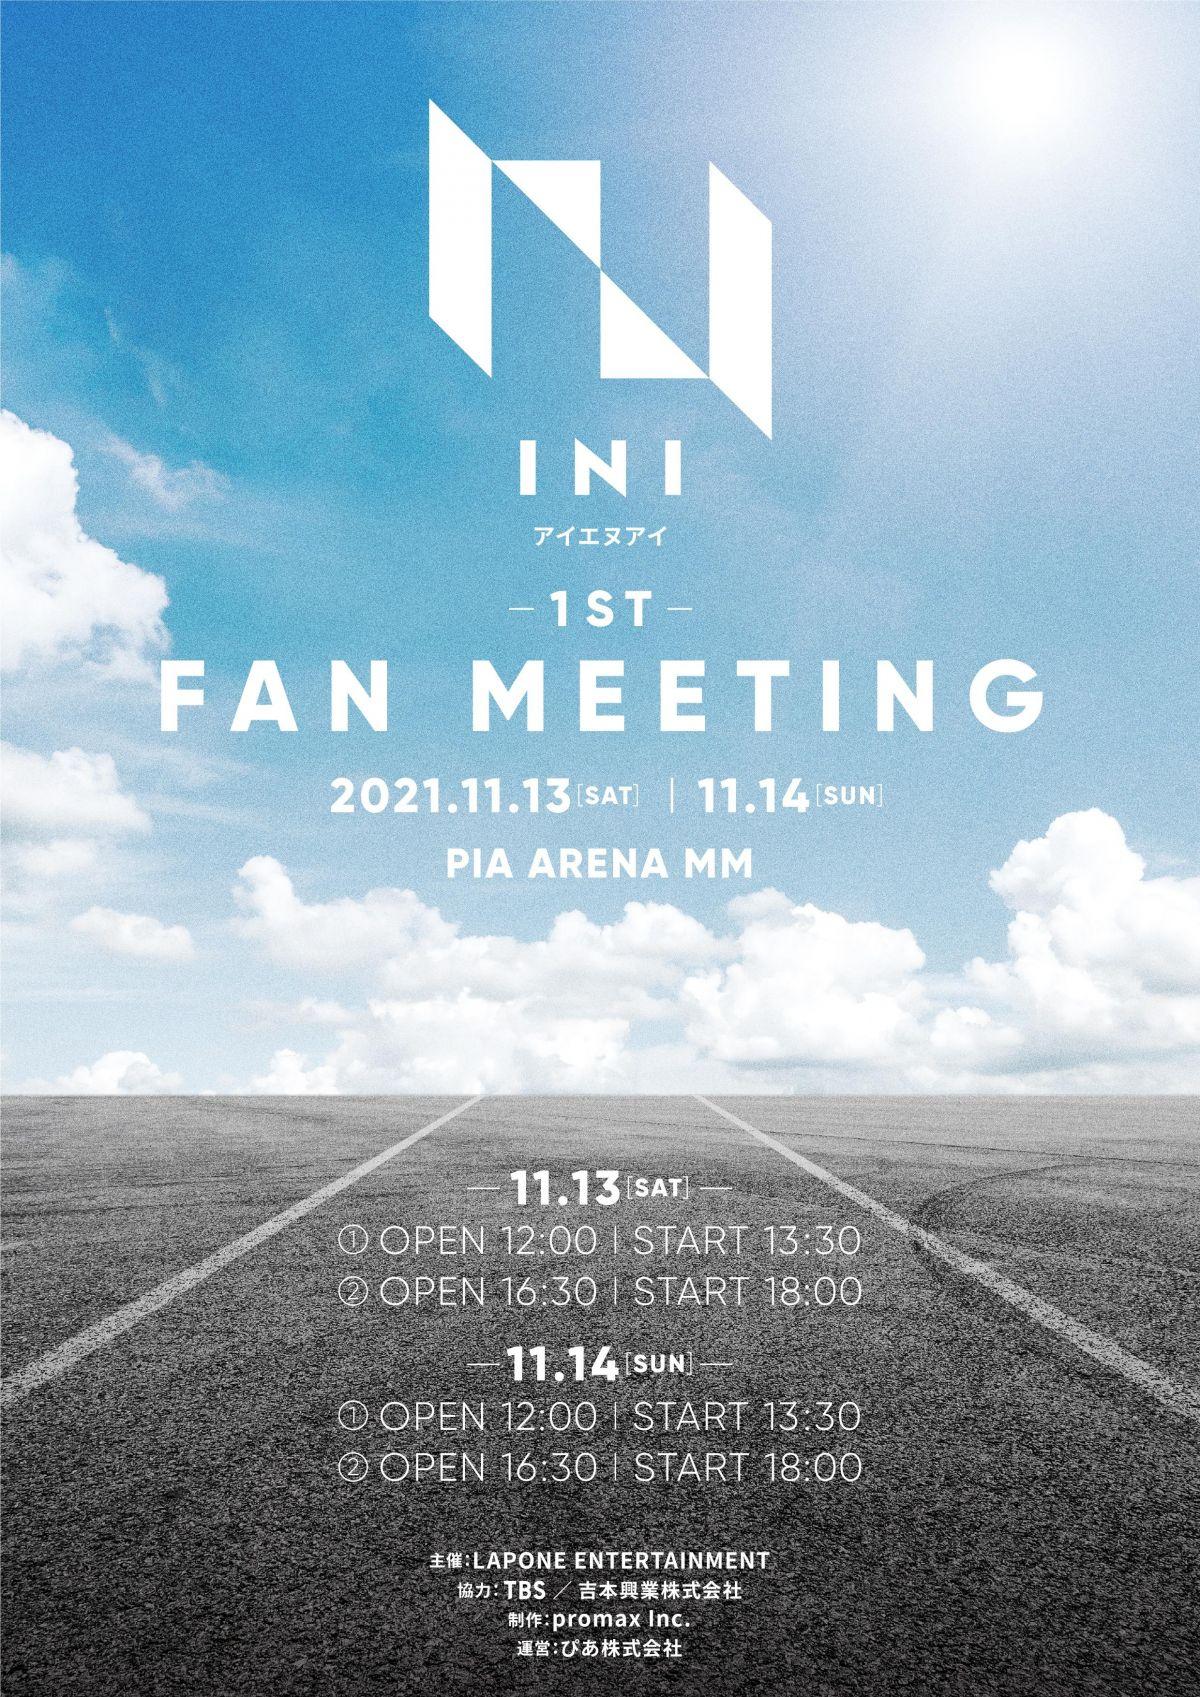 NI初のファンミーティング「INI 1ST FAN MEETING」が開催決定!INI OFFICIAL FANCLUB 会員1次先行受付開始!